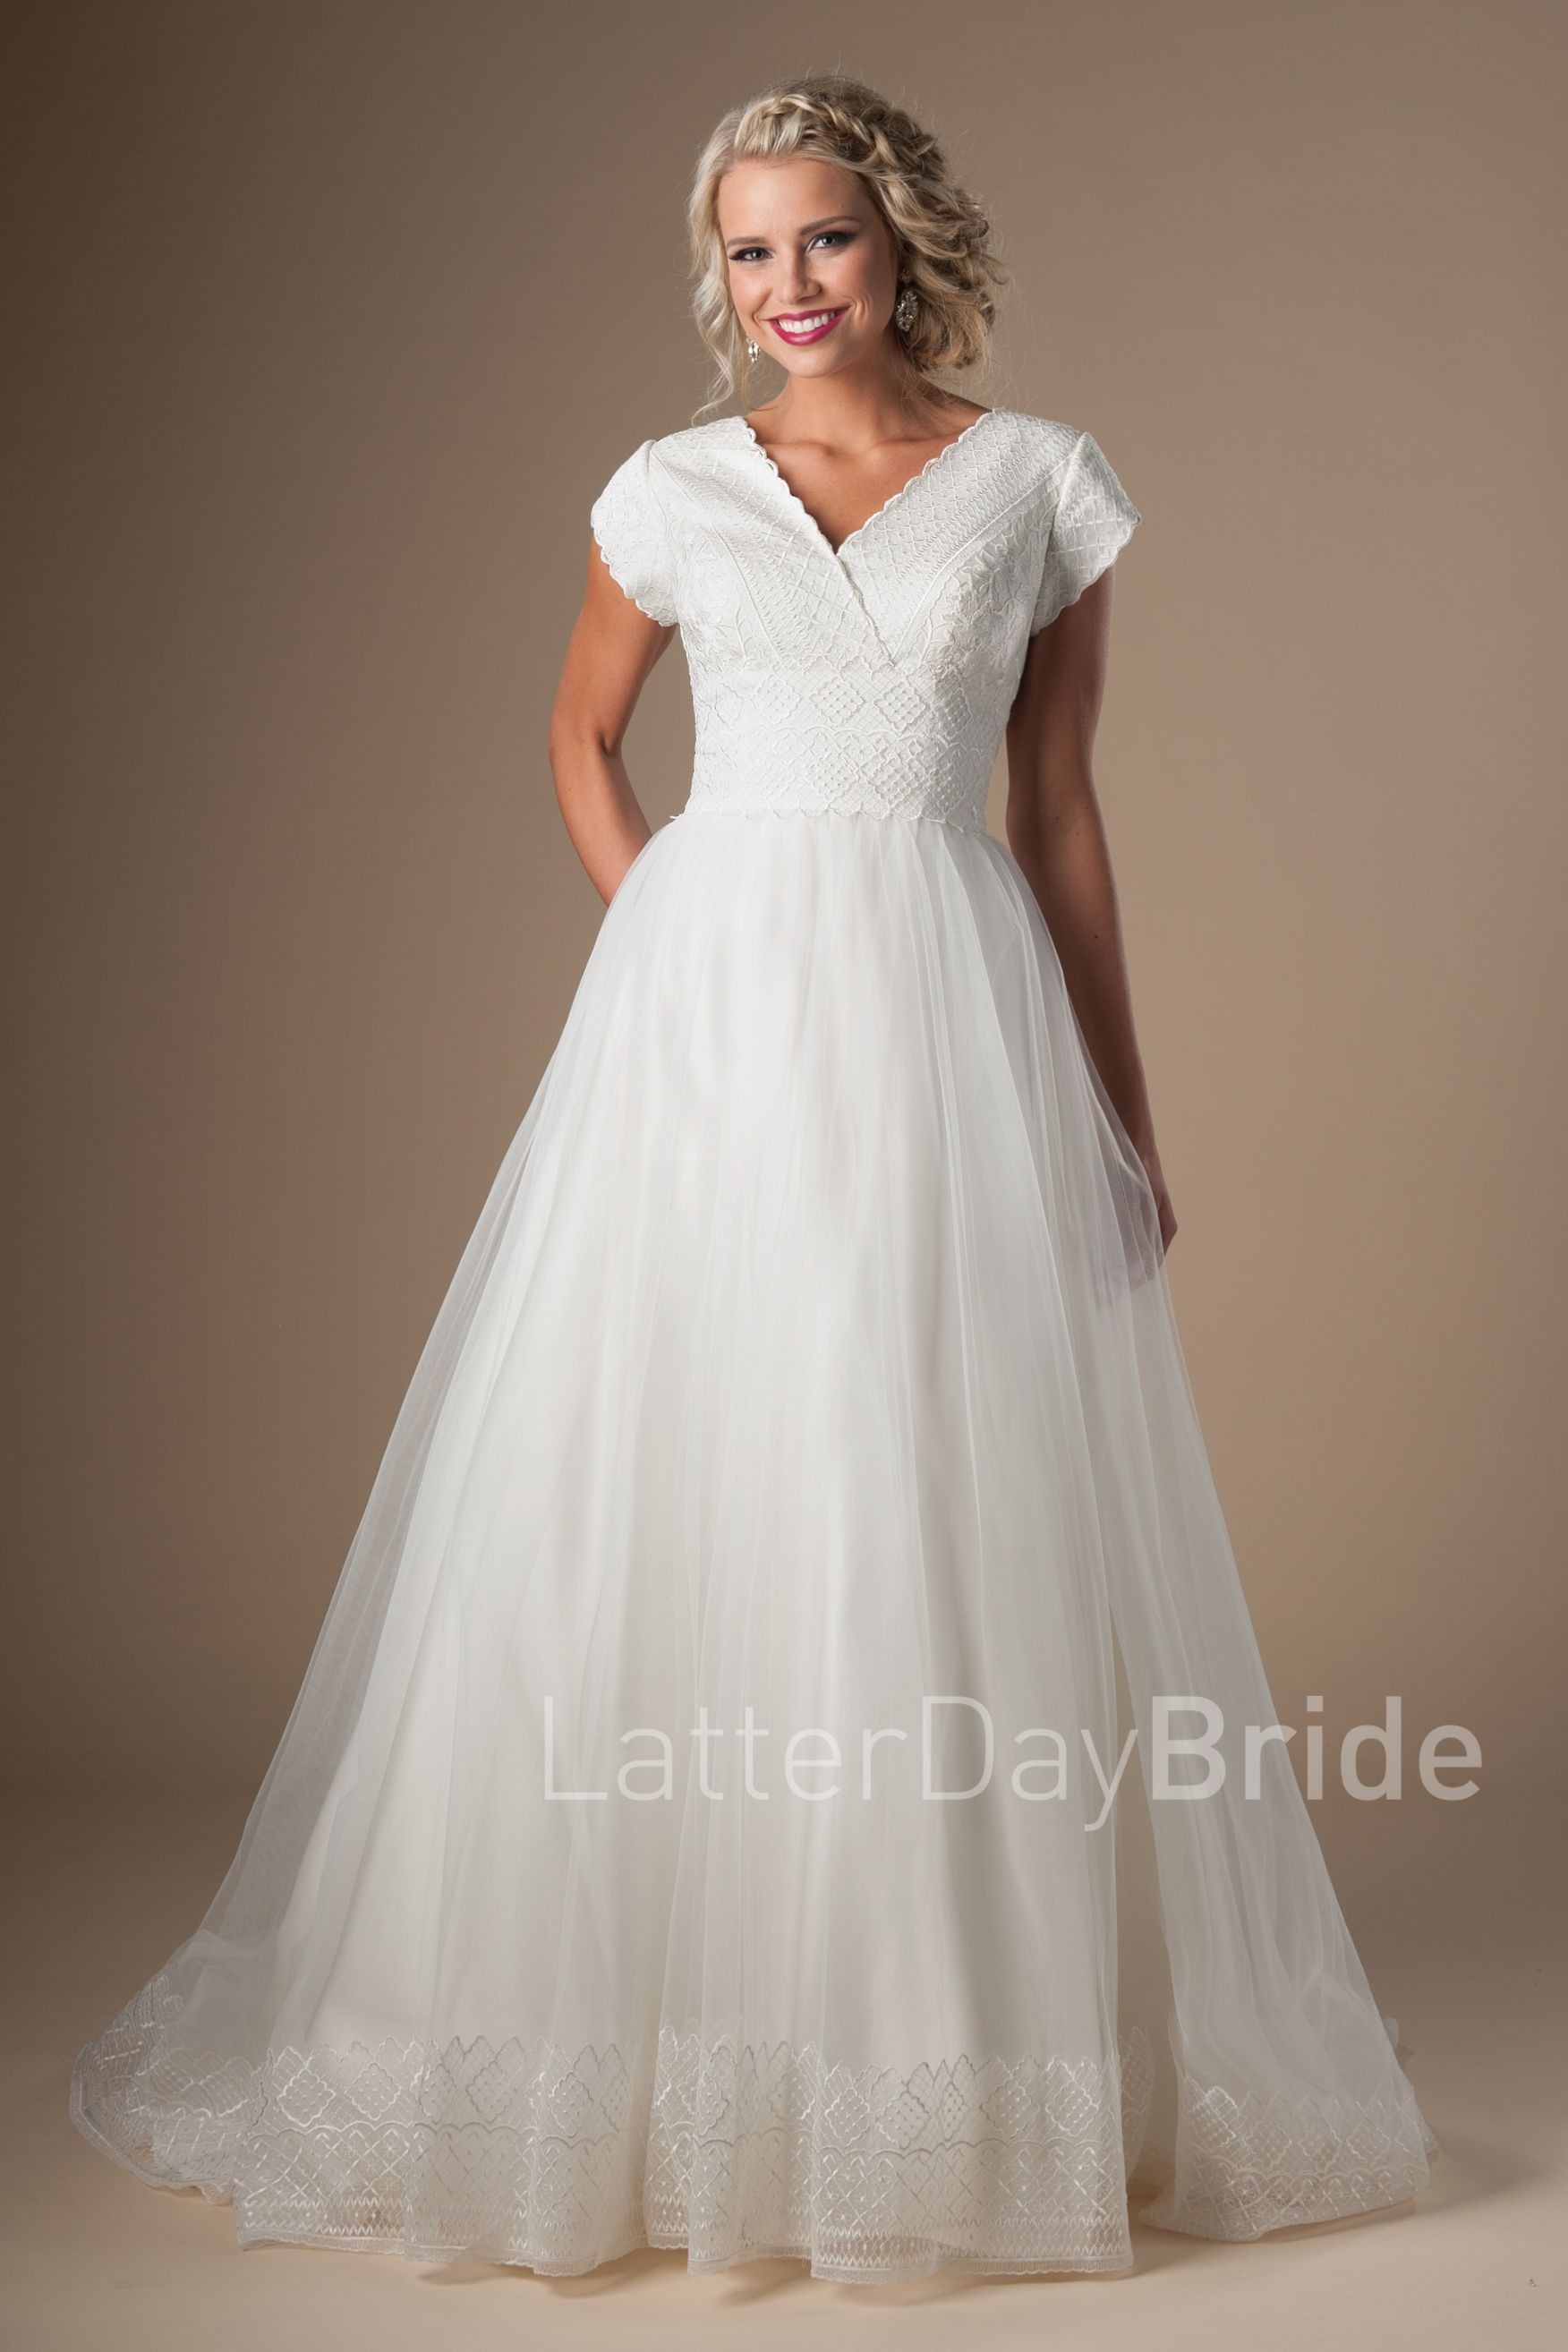 Modest long sleeve lace wedding dresses  Sylveon  Colors and Flowers  Pinterest  Modest wedding Modest